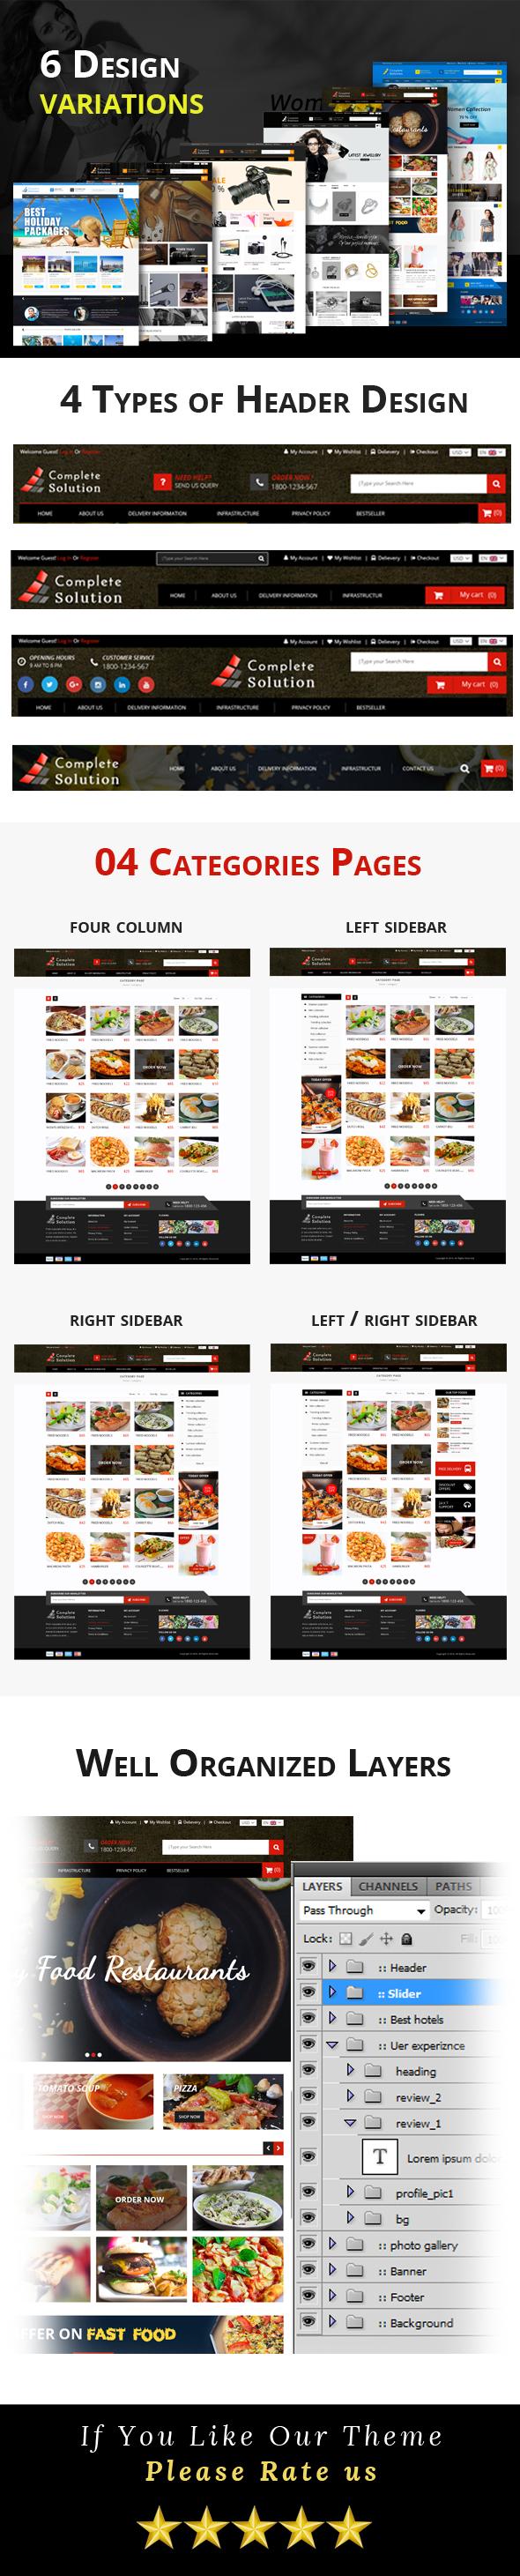 Complete Solution - Multipurpose E-Commerce PSD Template - 1